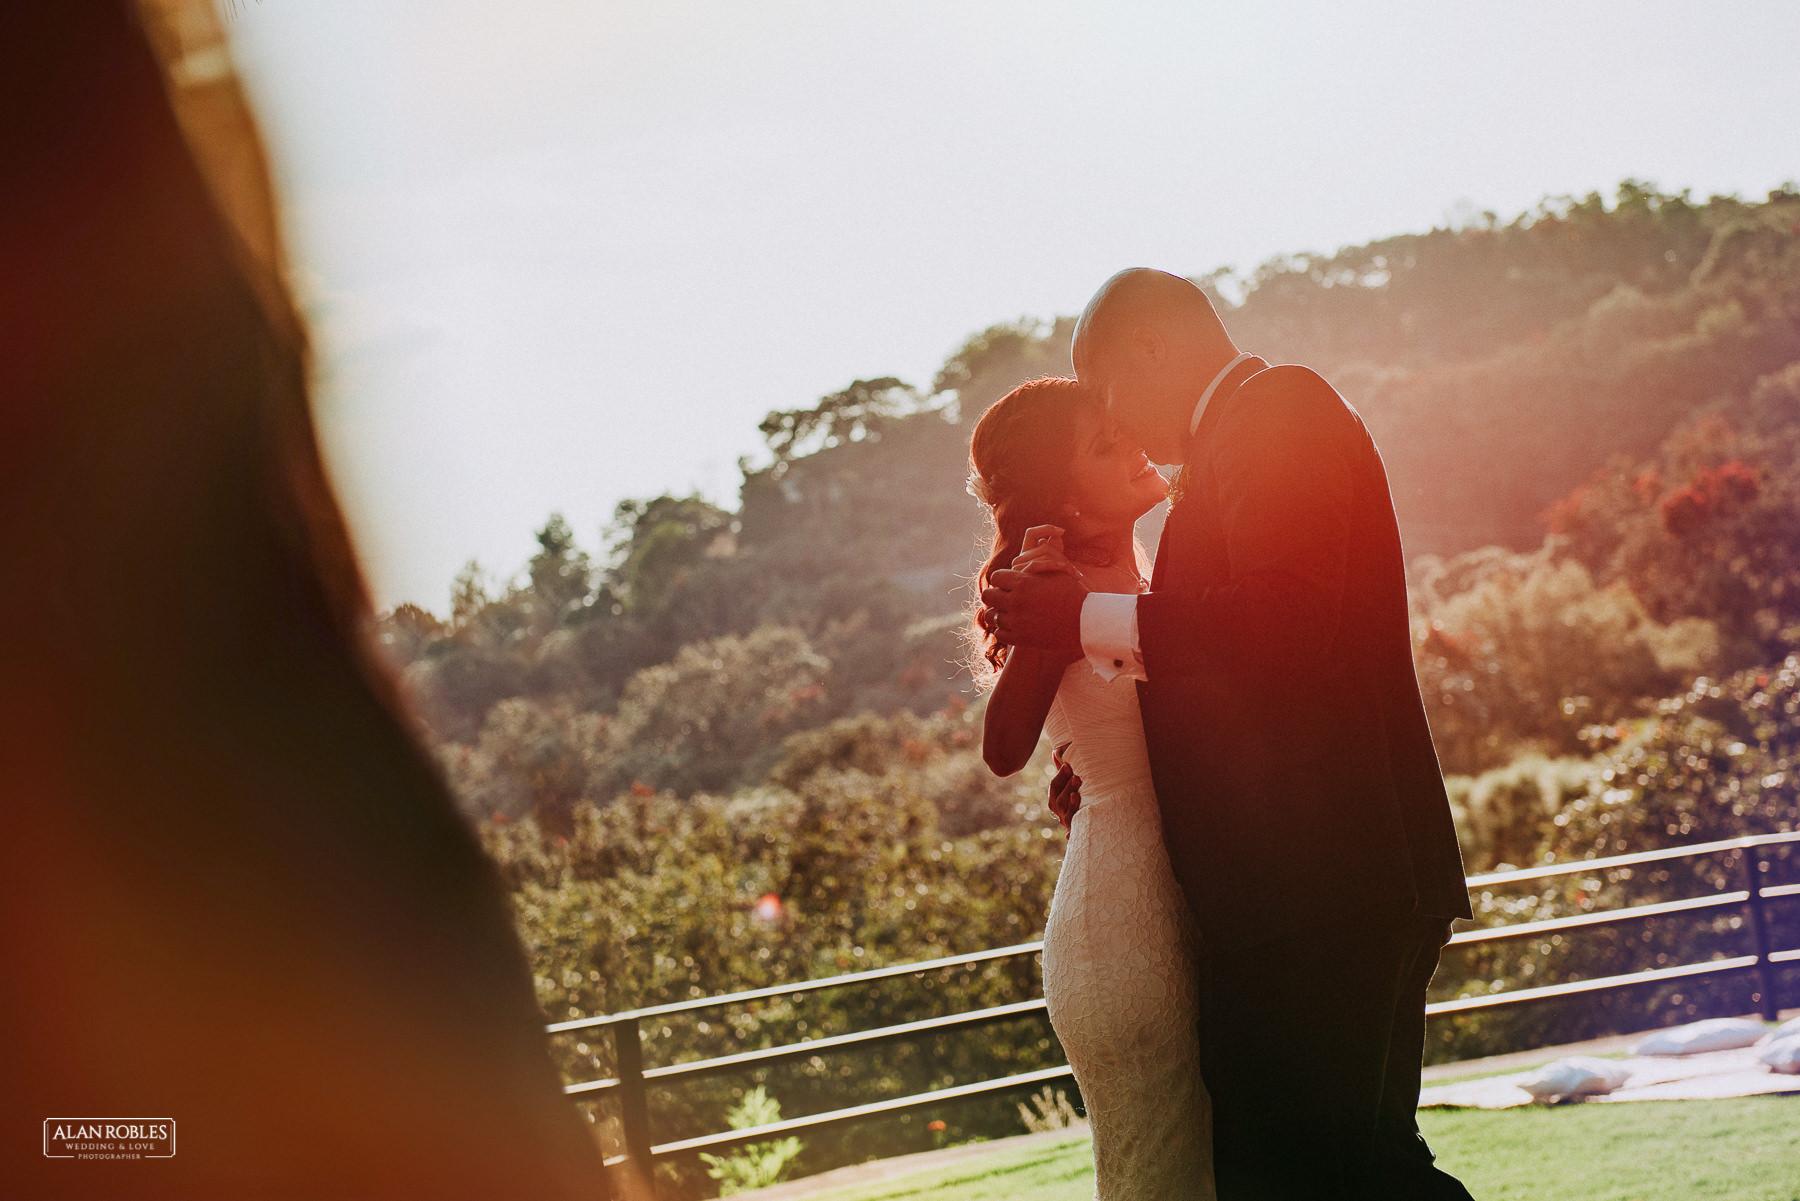 Fotografo de bodas guadalajara Alan Robles - Pinare terraza bistro 49